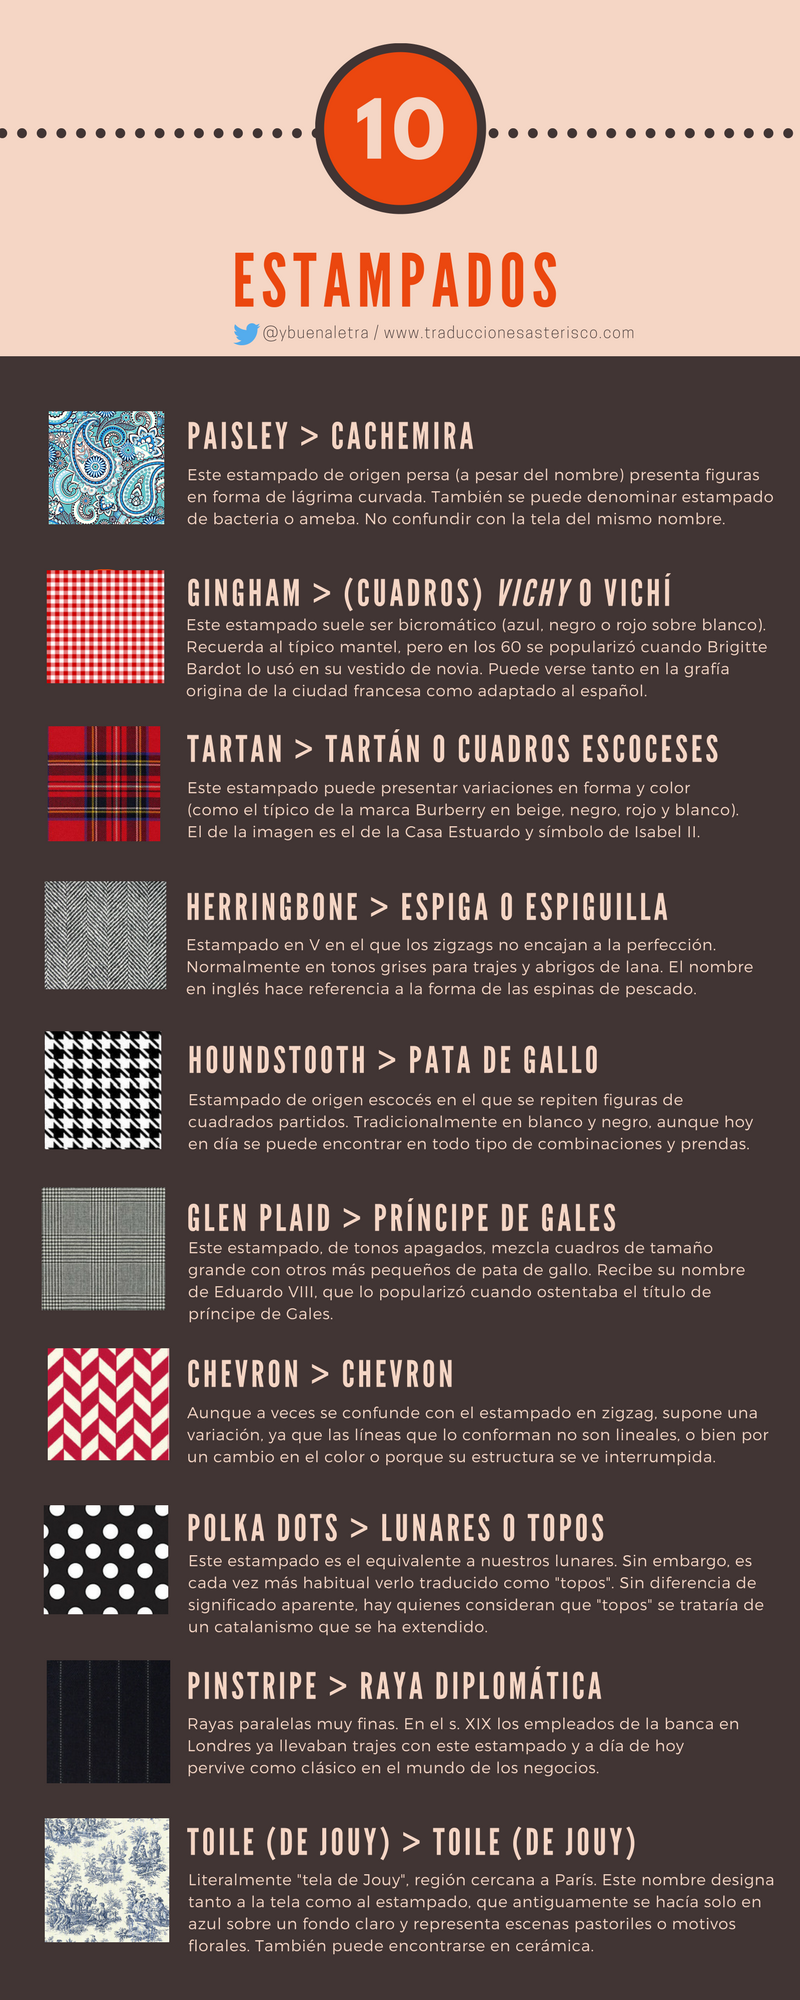 Pin by Giedre Asín Marco on Terminología textil | Pinterest